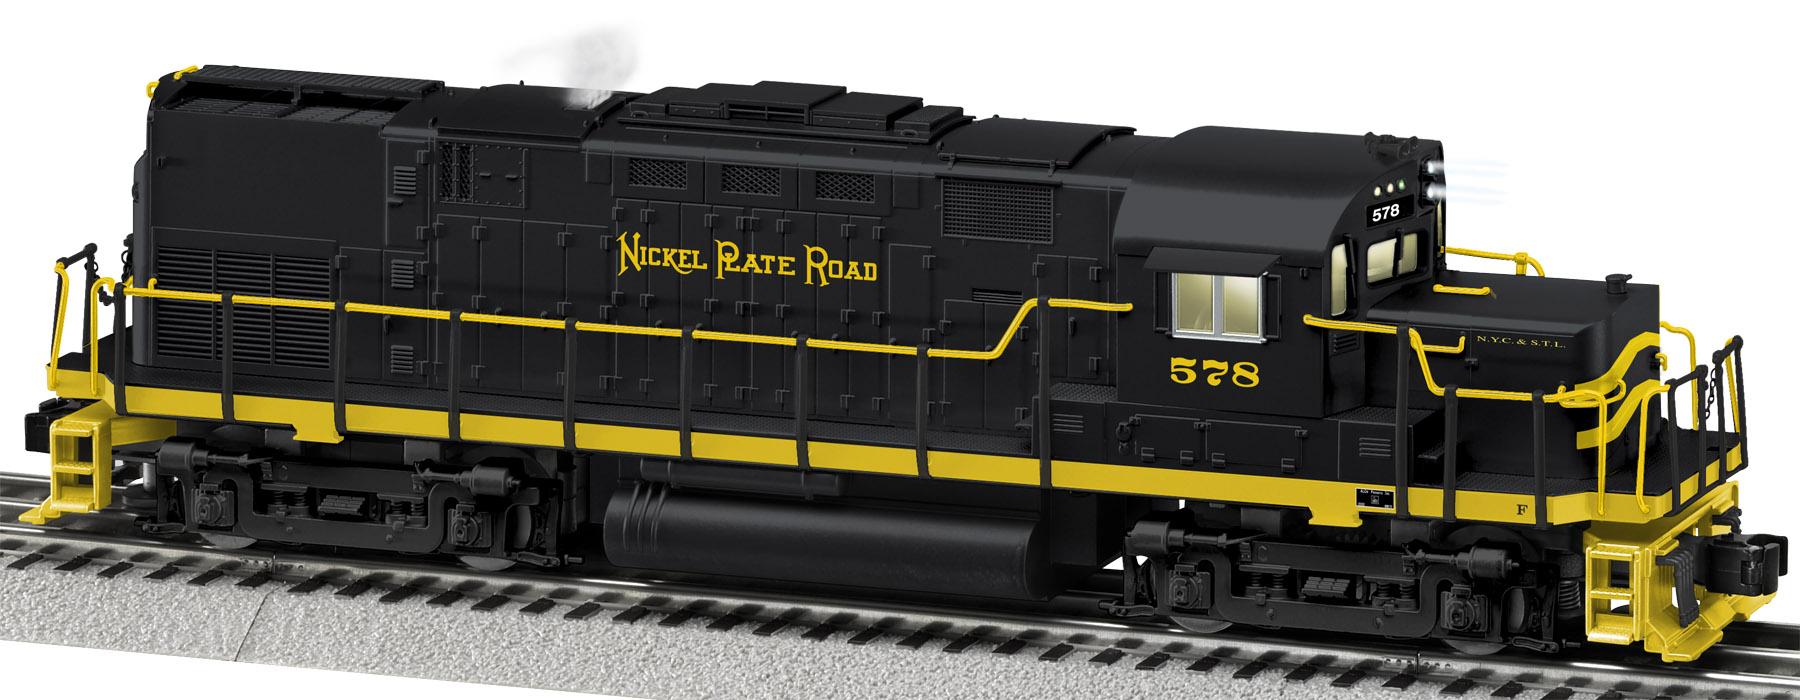 34760 The Nickel...C 420